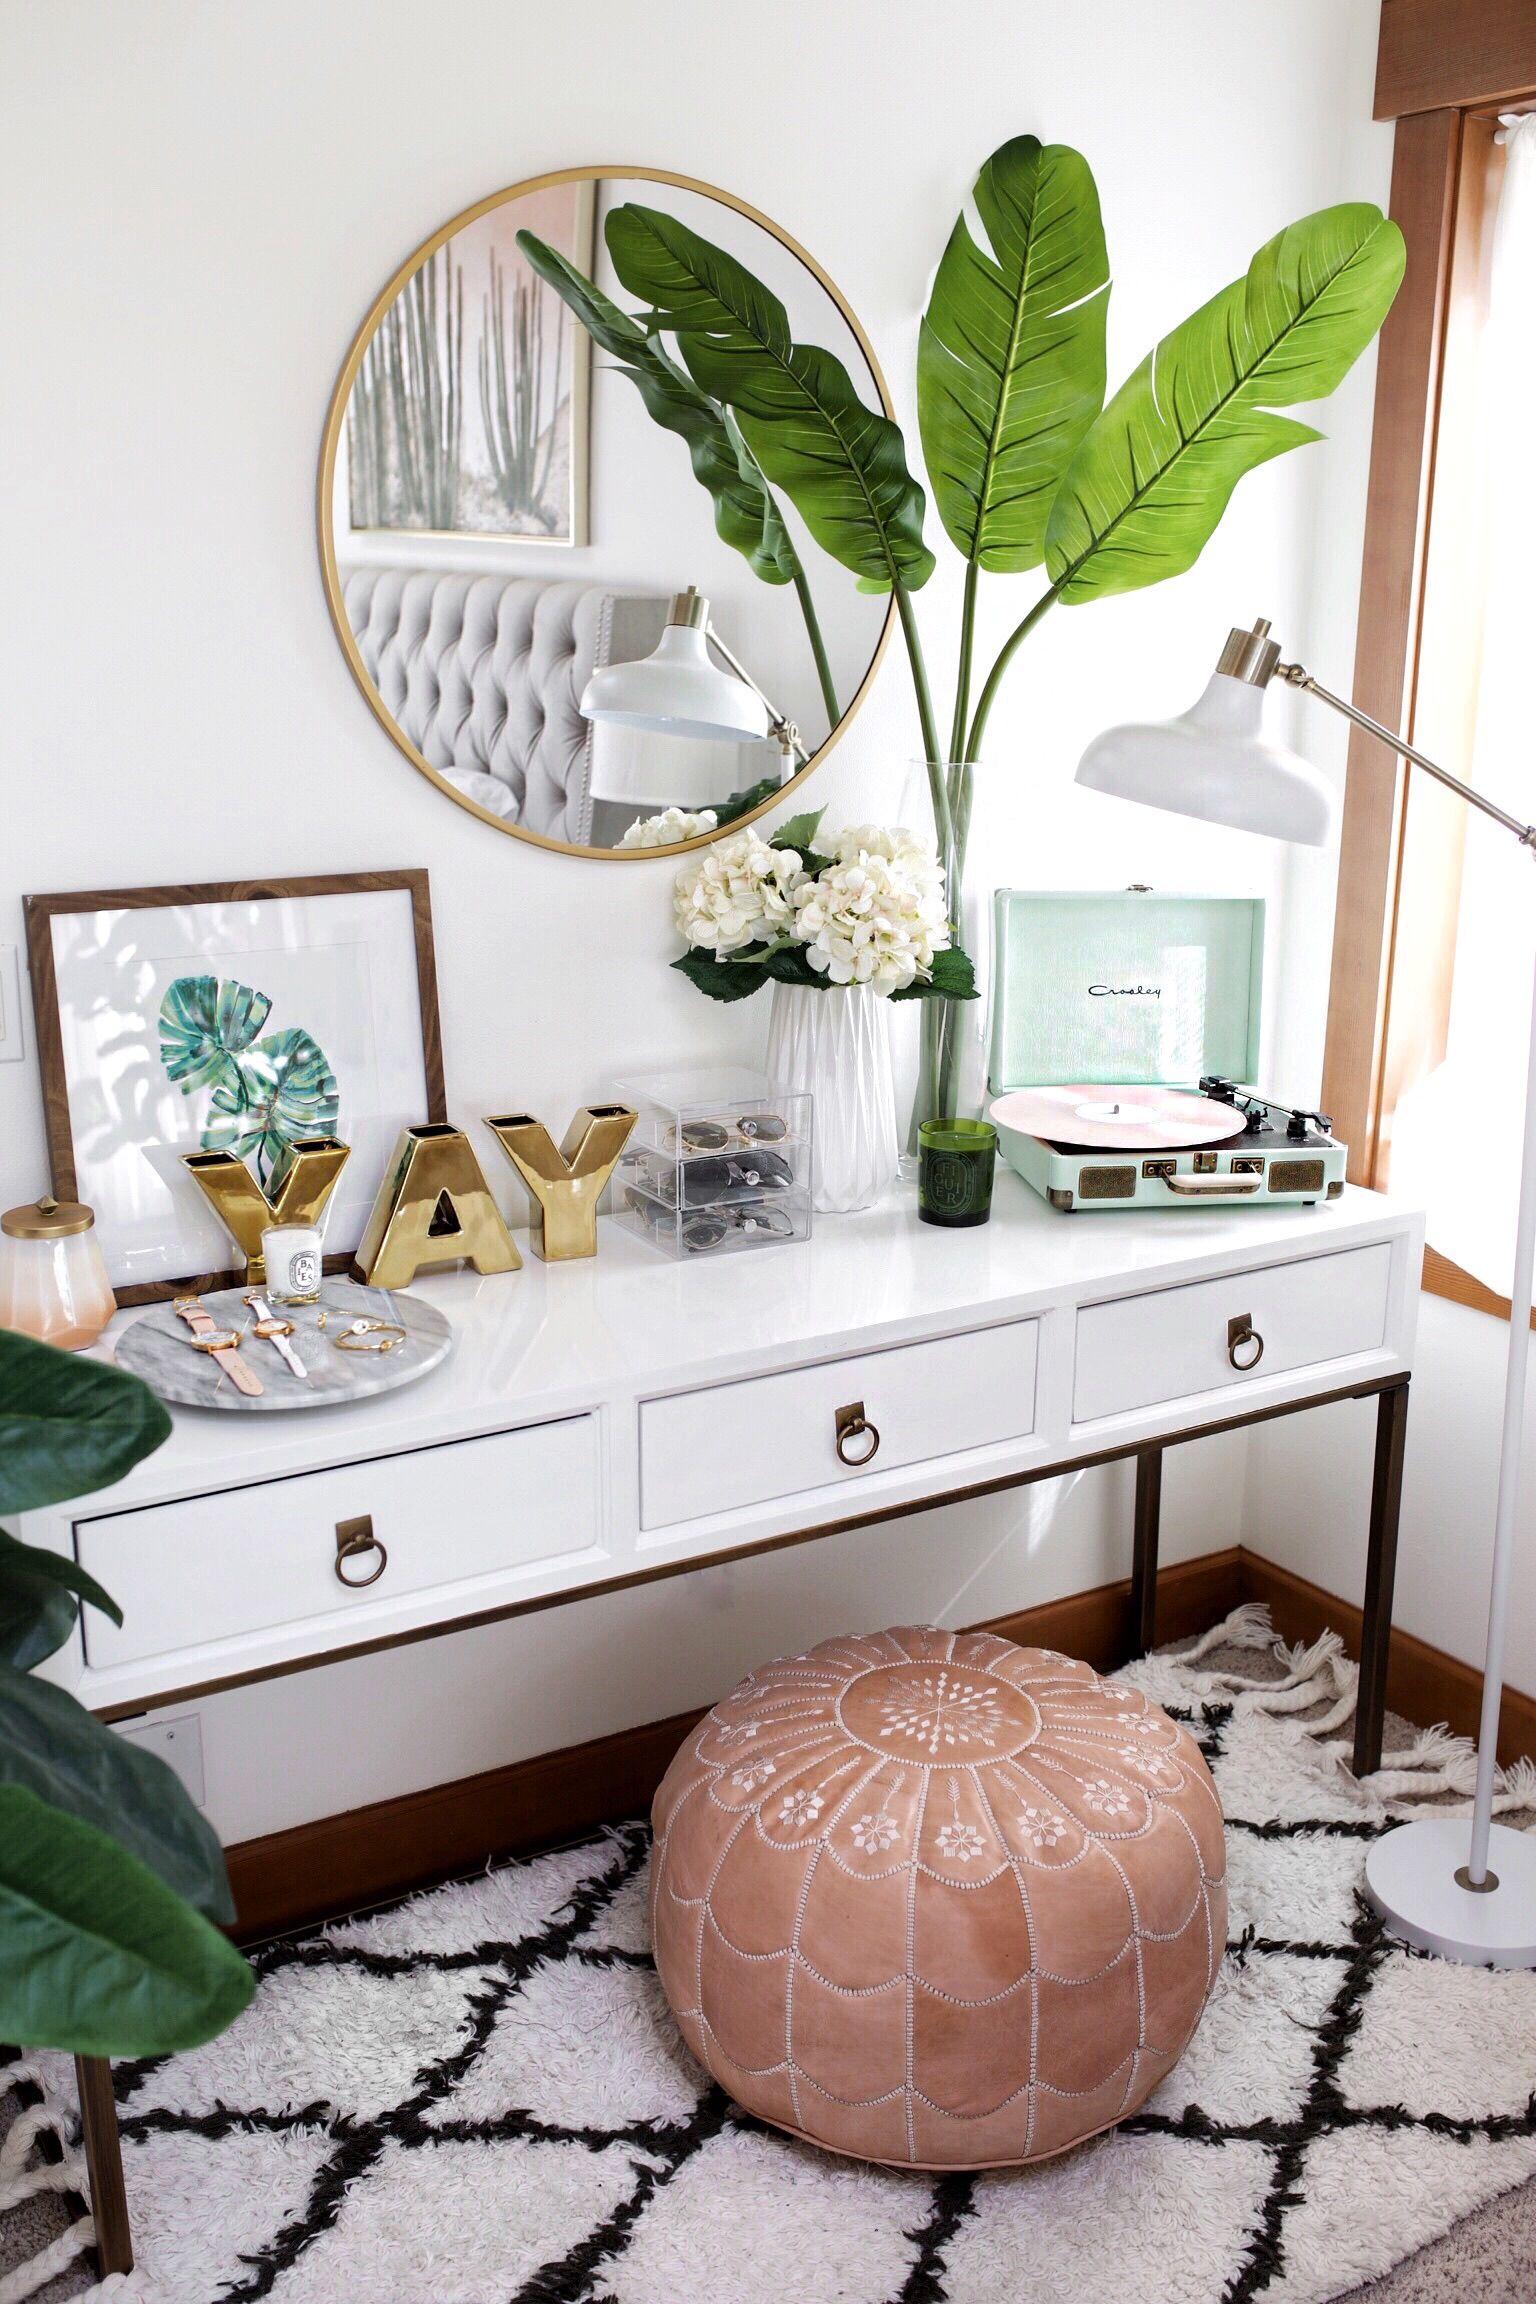 Plastic Artificial Flowers Outdoors | Room decor, Home ...